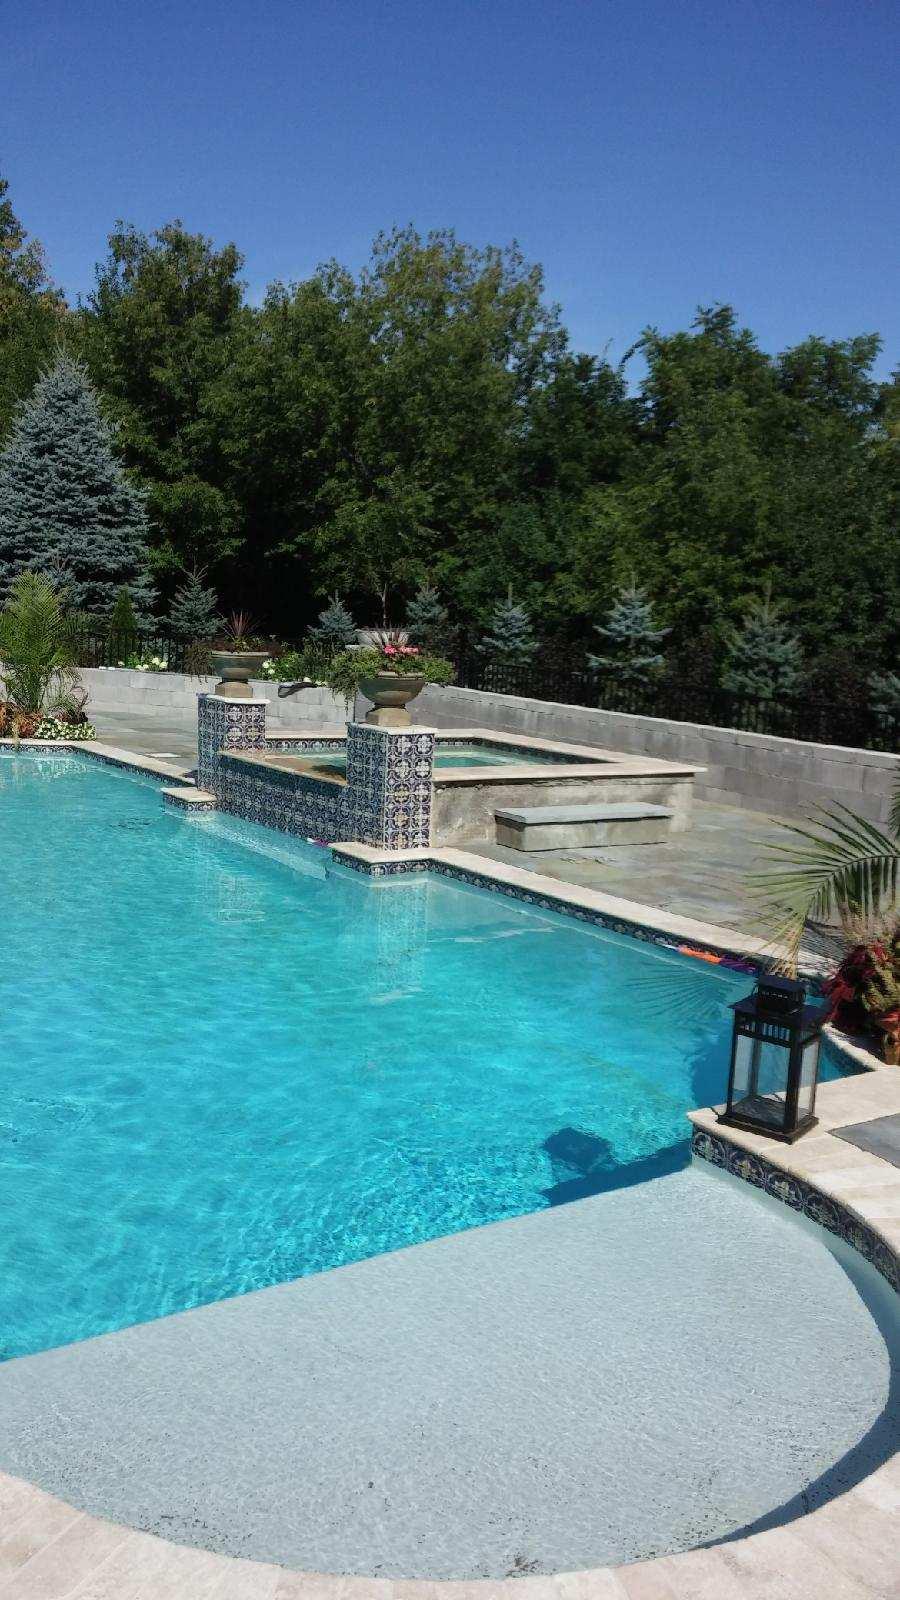 prestige-pools_michigan_pool-remodel_pool-renovation_new-pool_10.jpg